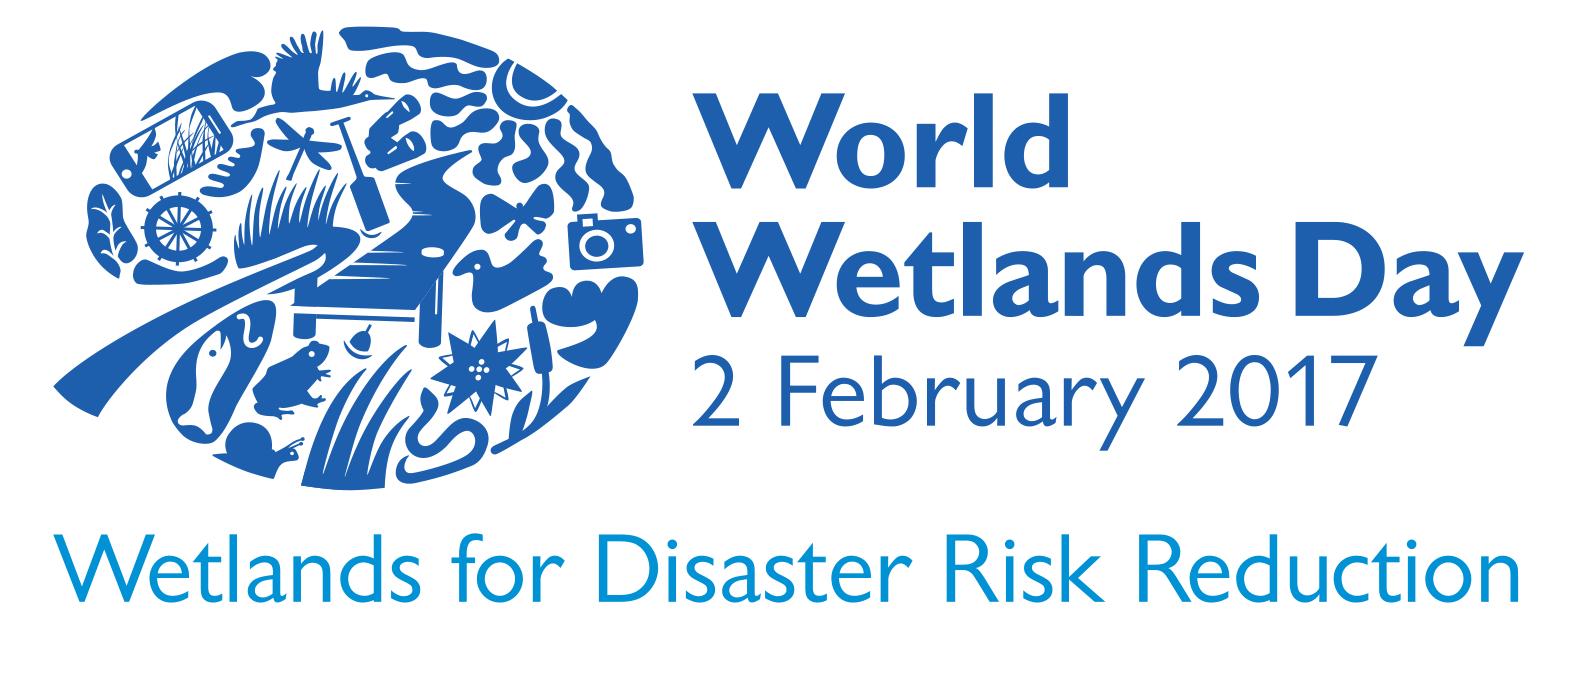 World Wetlands Day logo